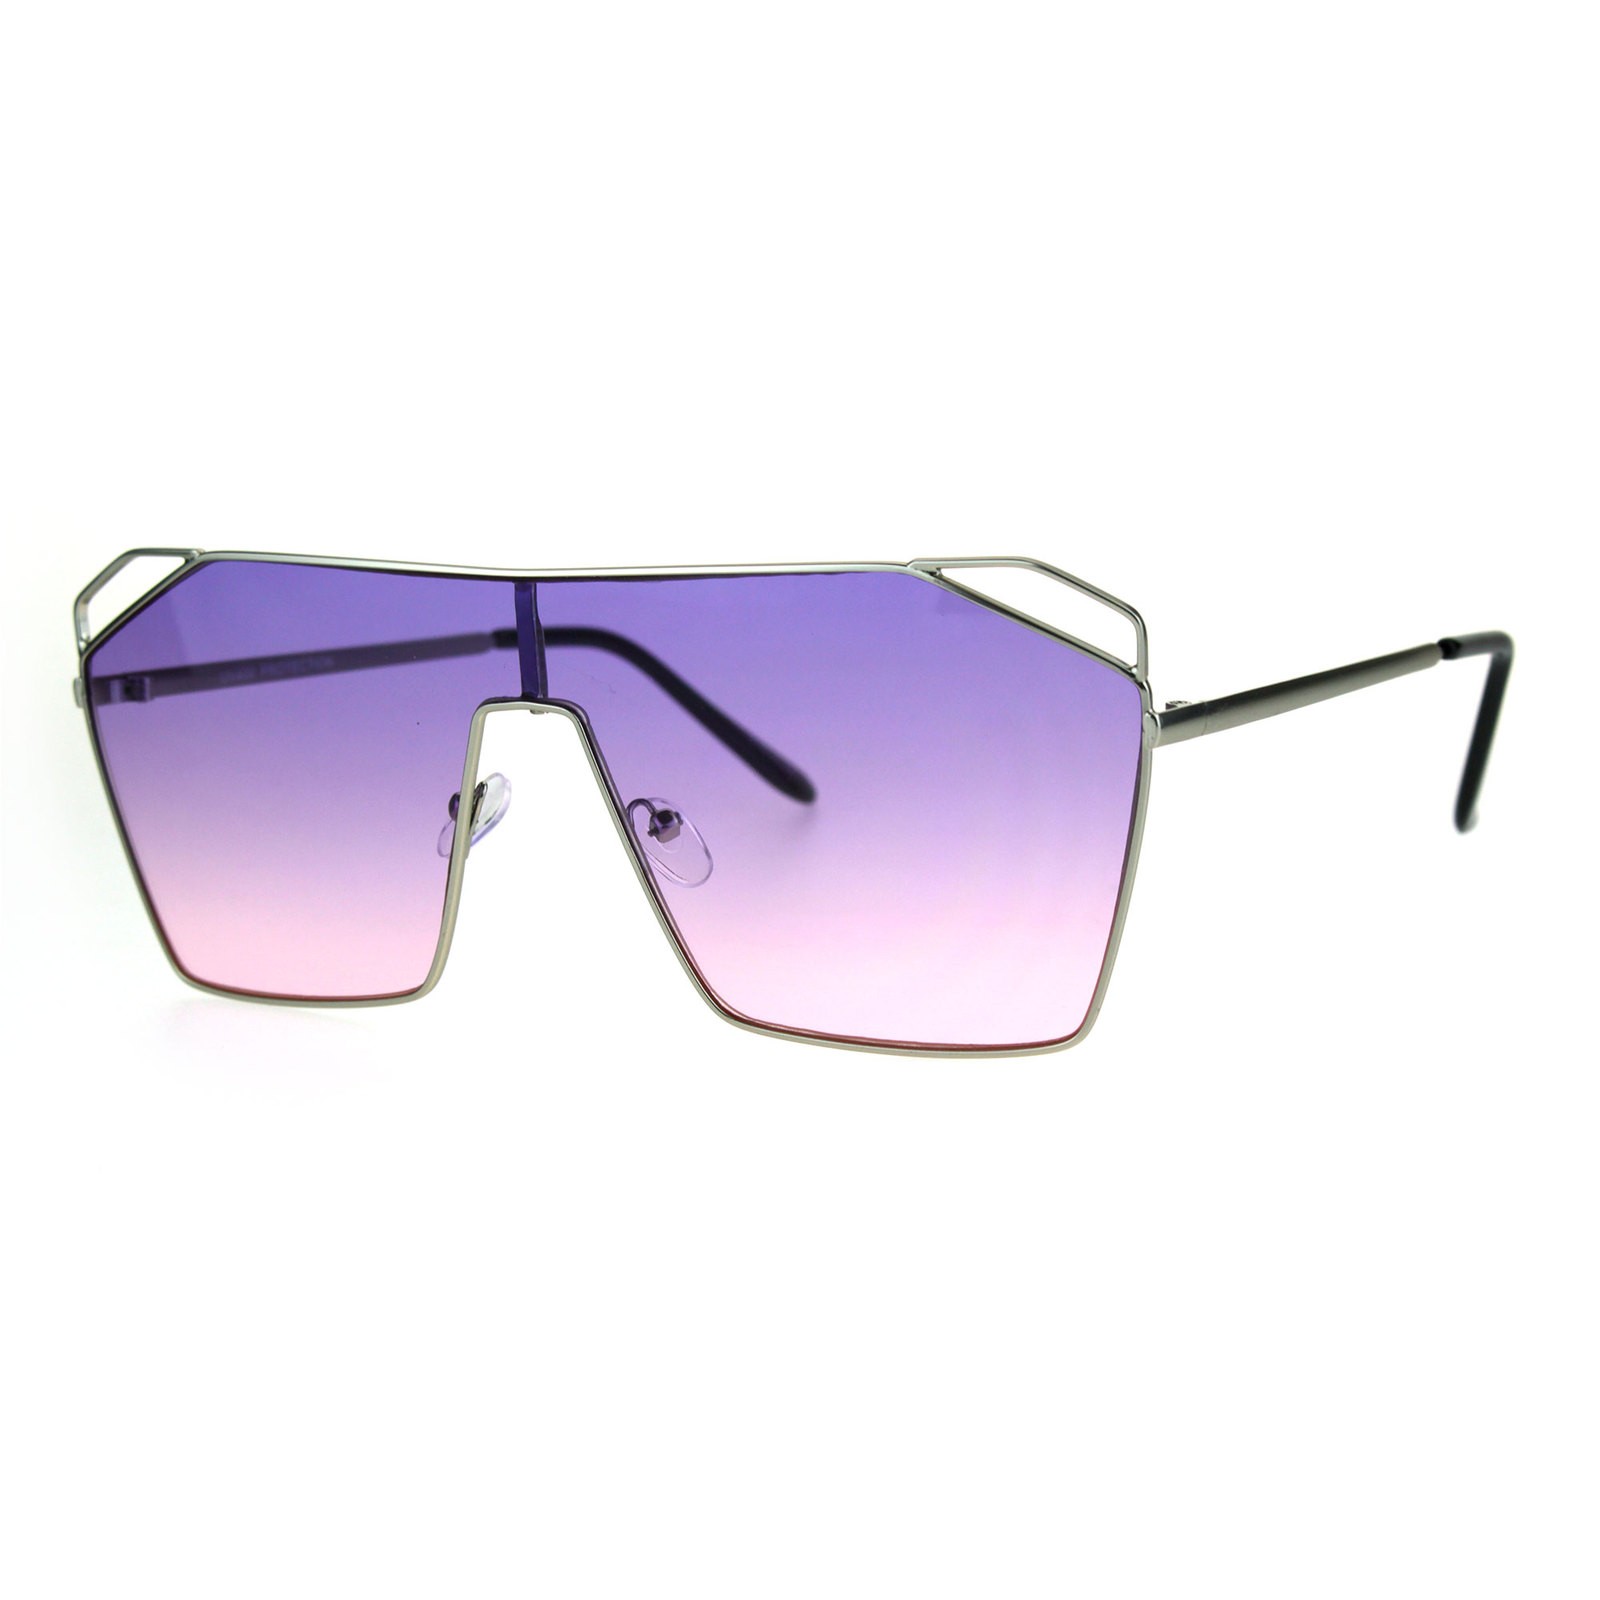 a51b3dc9c7 ... Womens Oceanic Gradient Futurist Shield Robotic Metal Aviator Sunglasses  ...